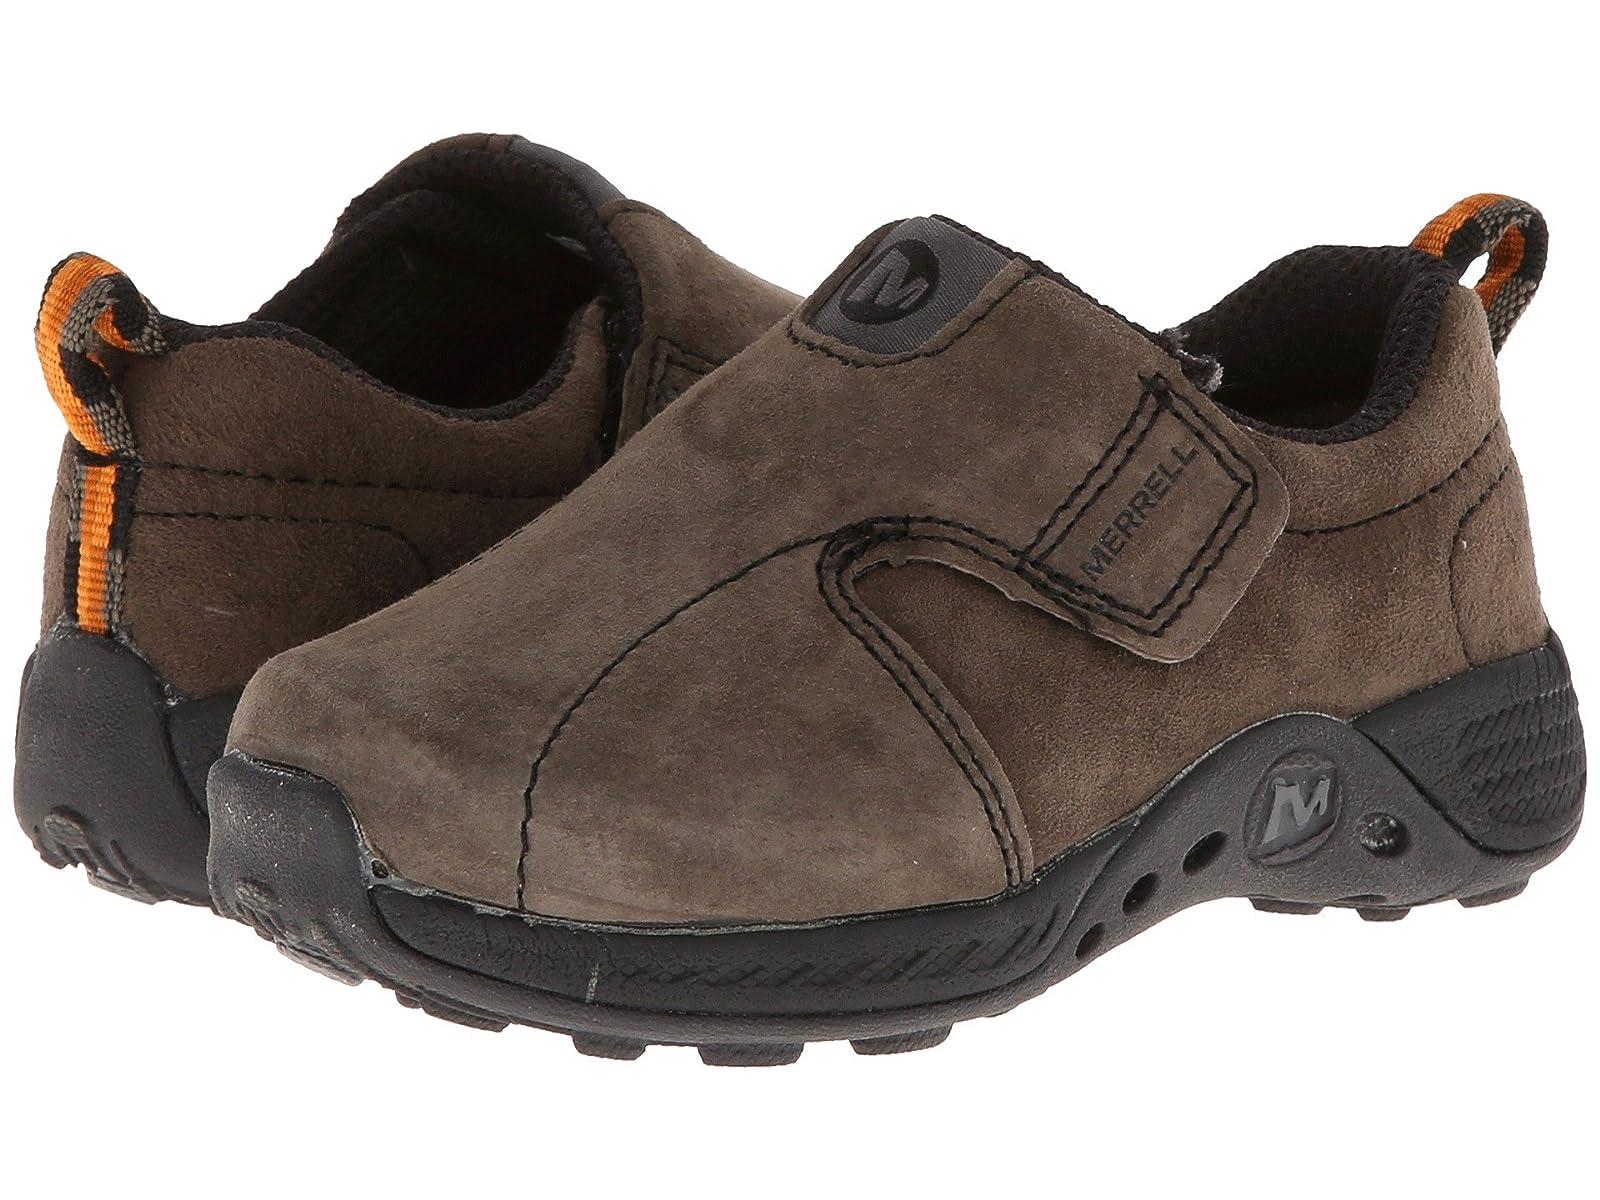 Merrell Kids Jungle Moc Sport A/C (Toddler)Atmospheric grades have affordable shoes